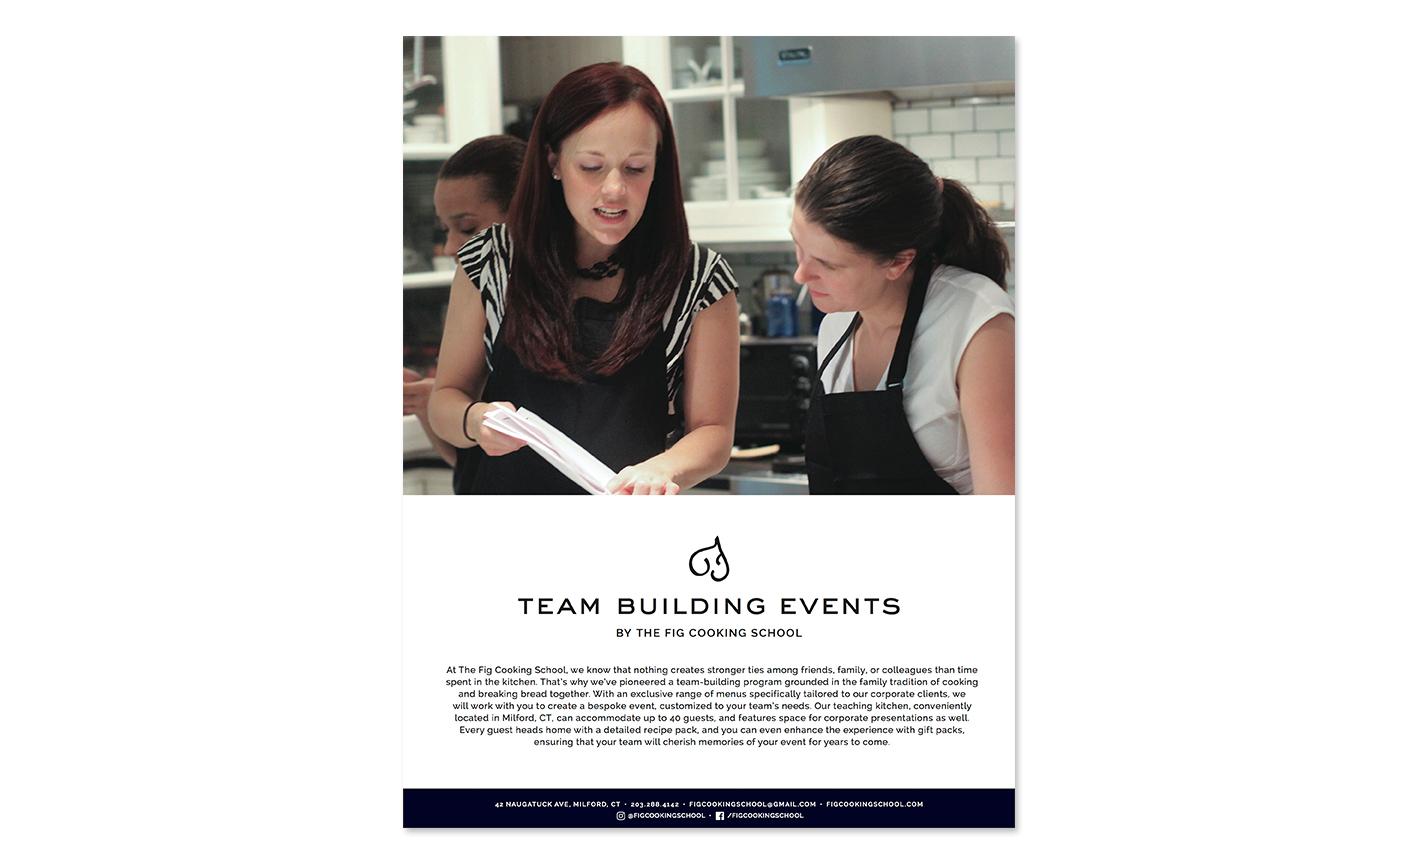 Team_building_pic.jpg